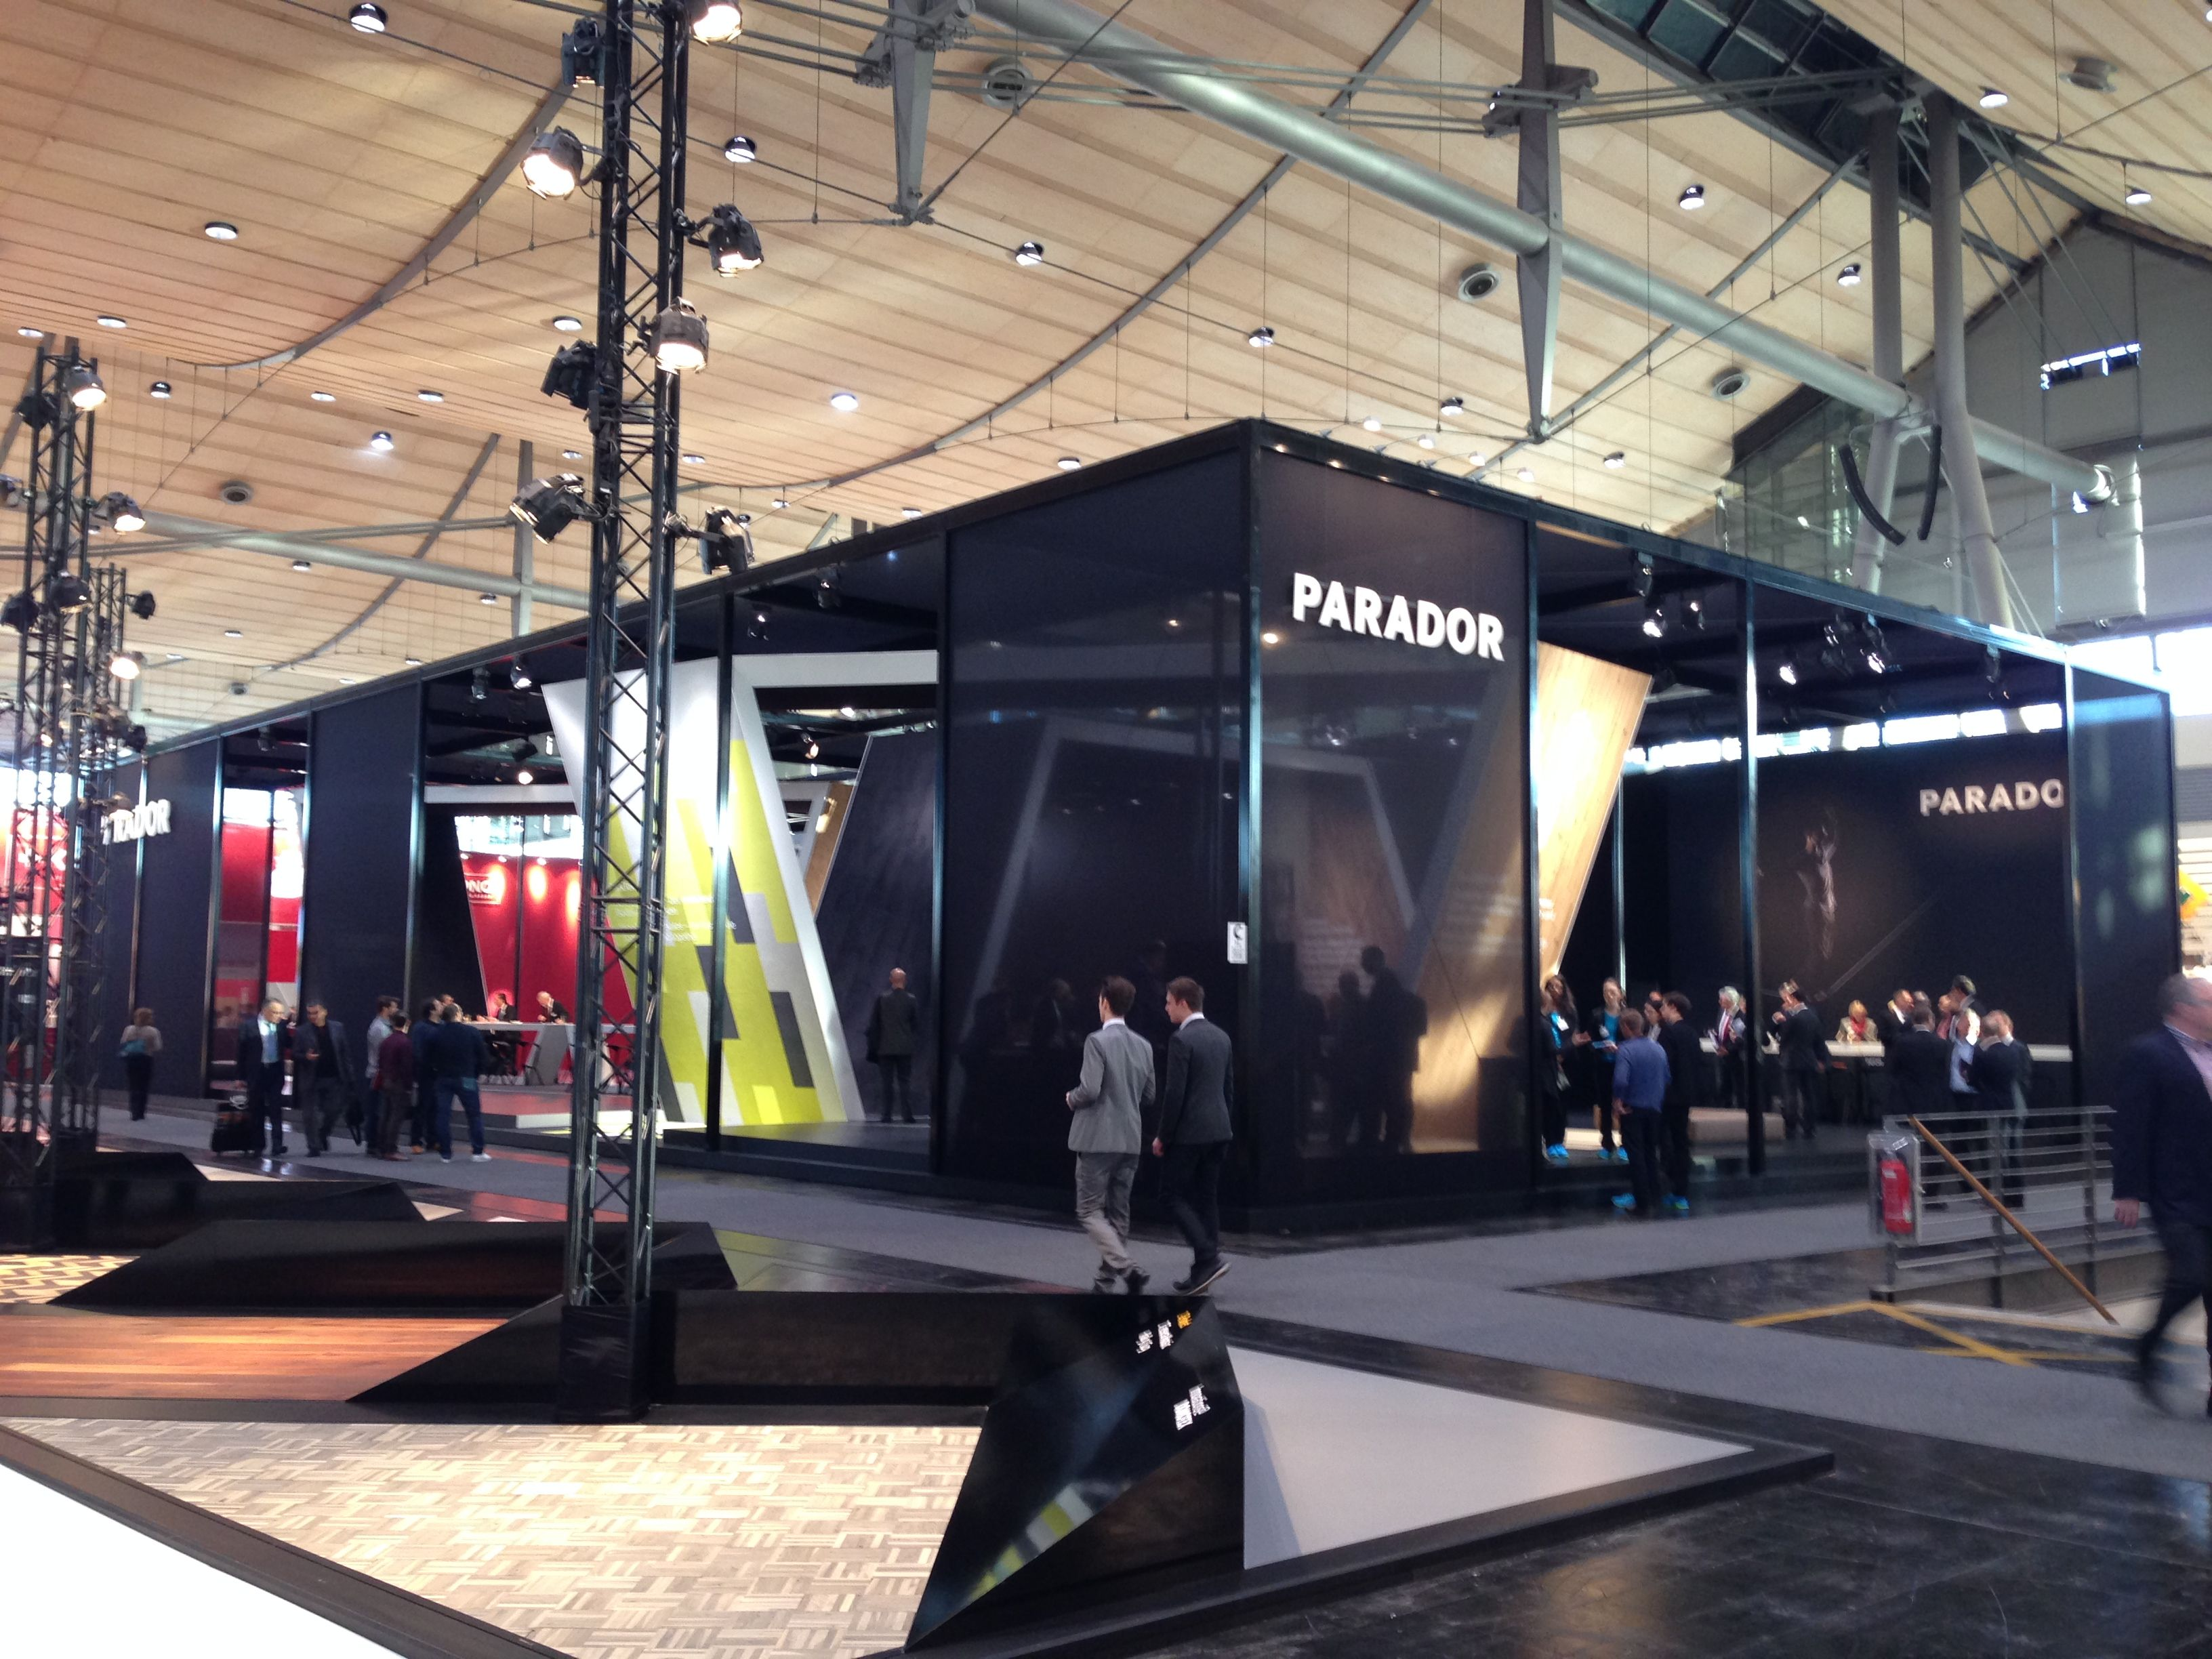 Parkett Hannover der parador messestand auf der domotex 2014 in hannover messe